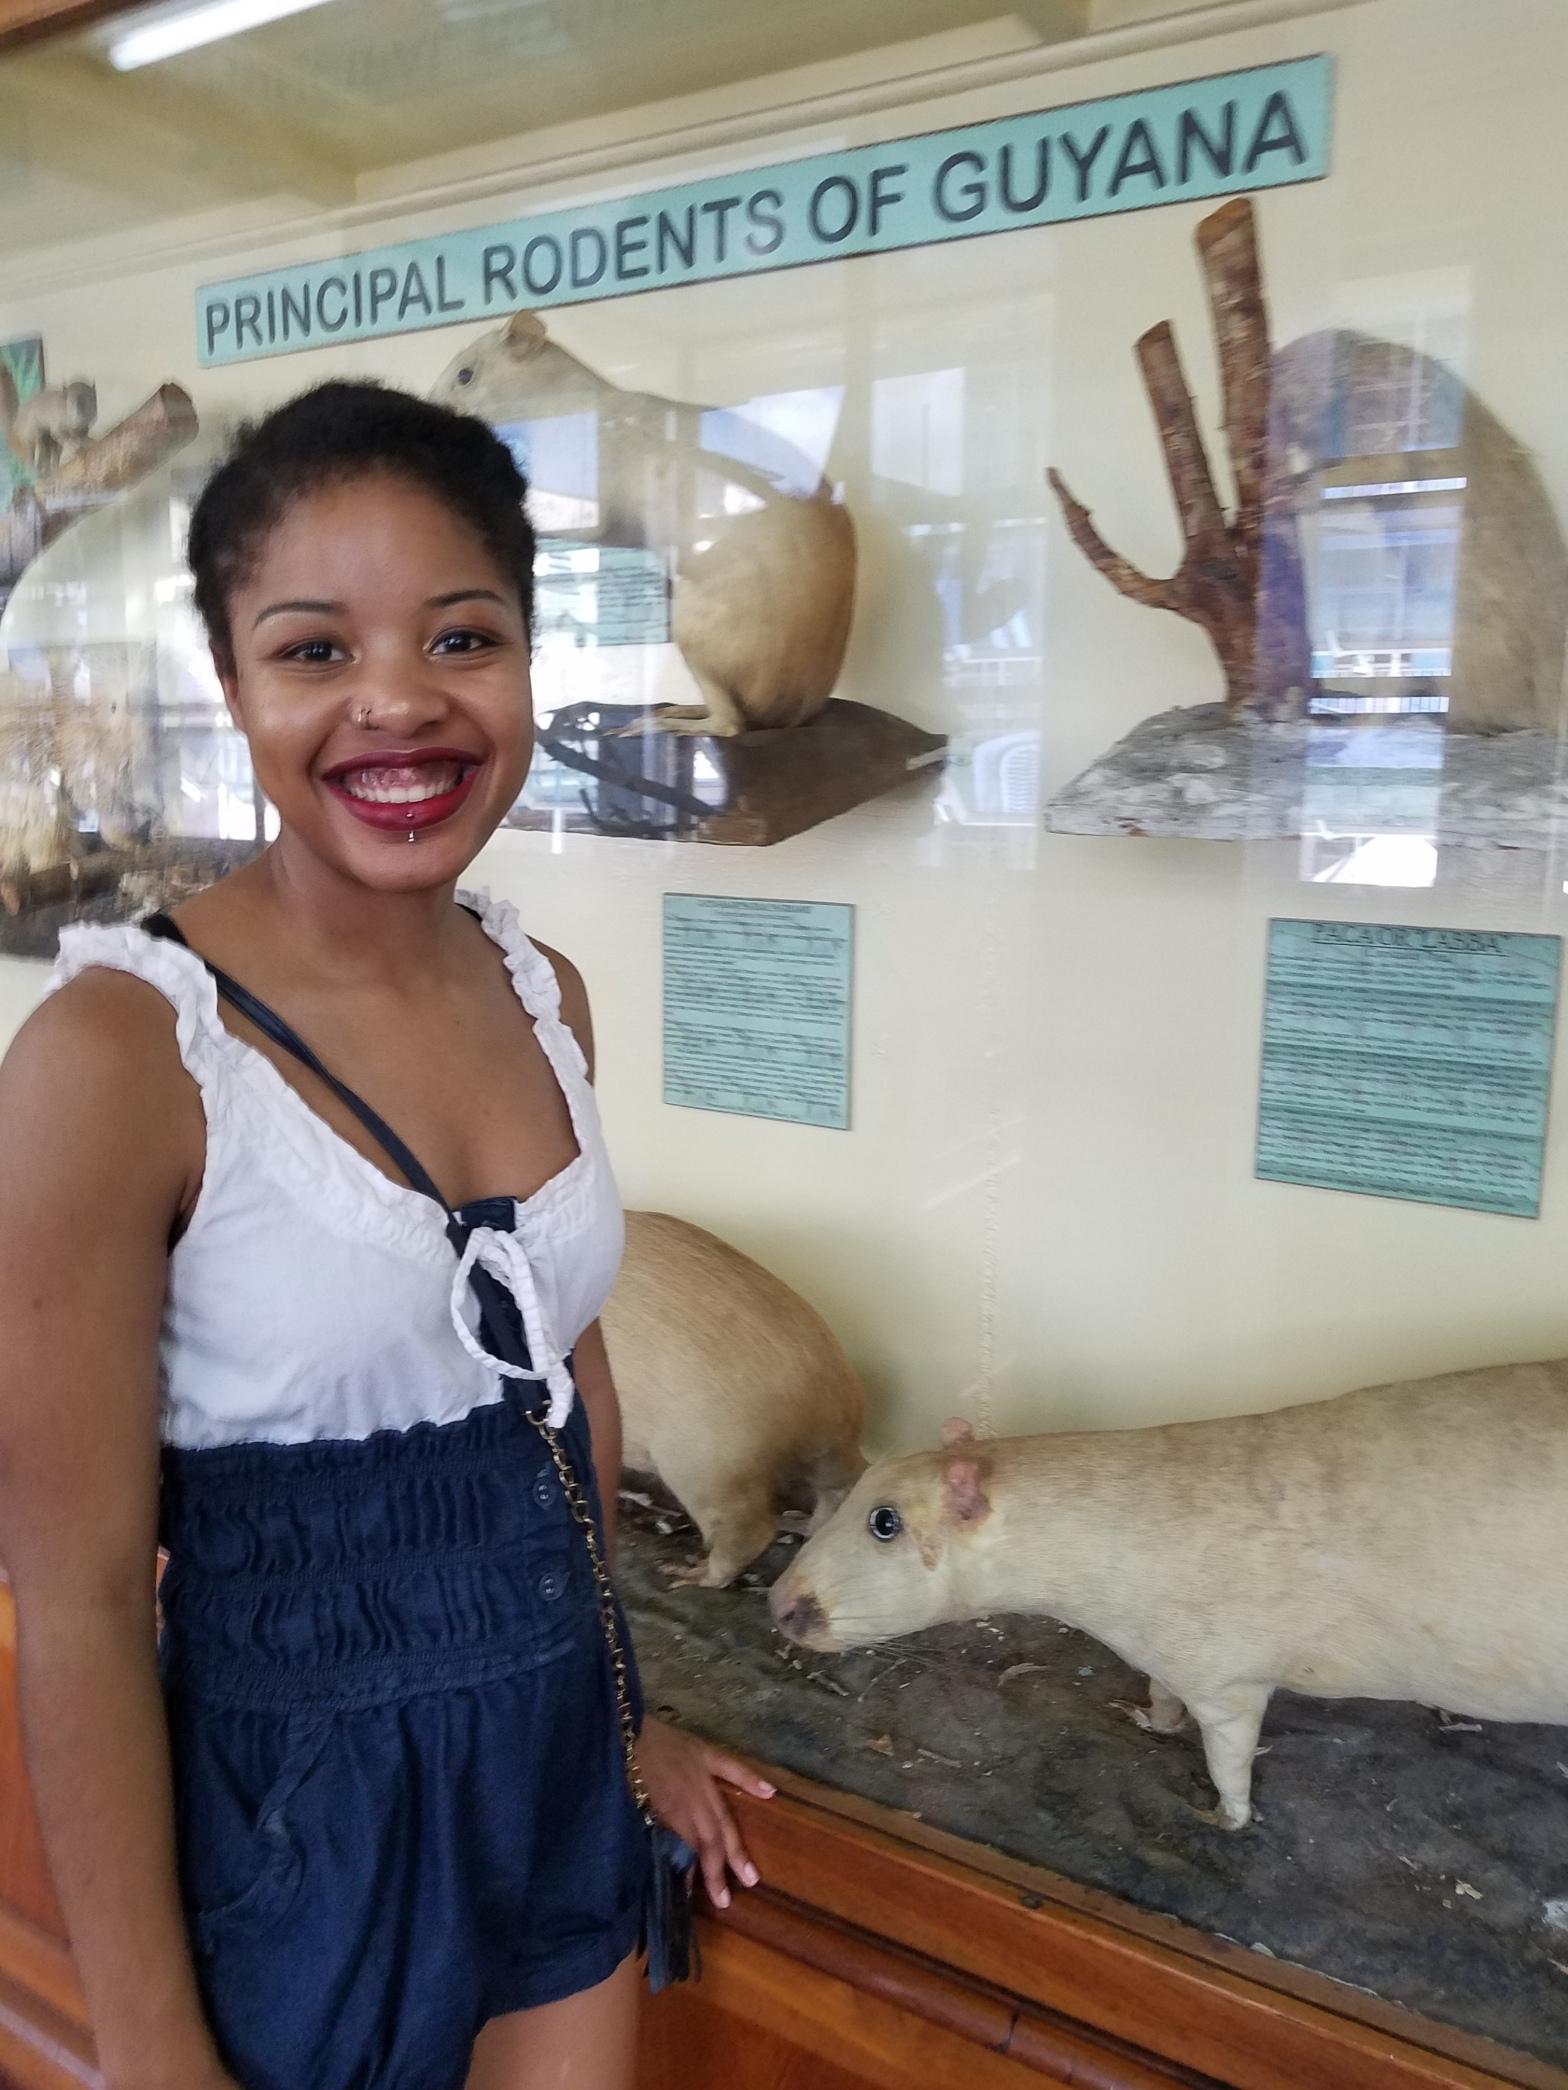 Me Visiting the Guyana National Museum